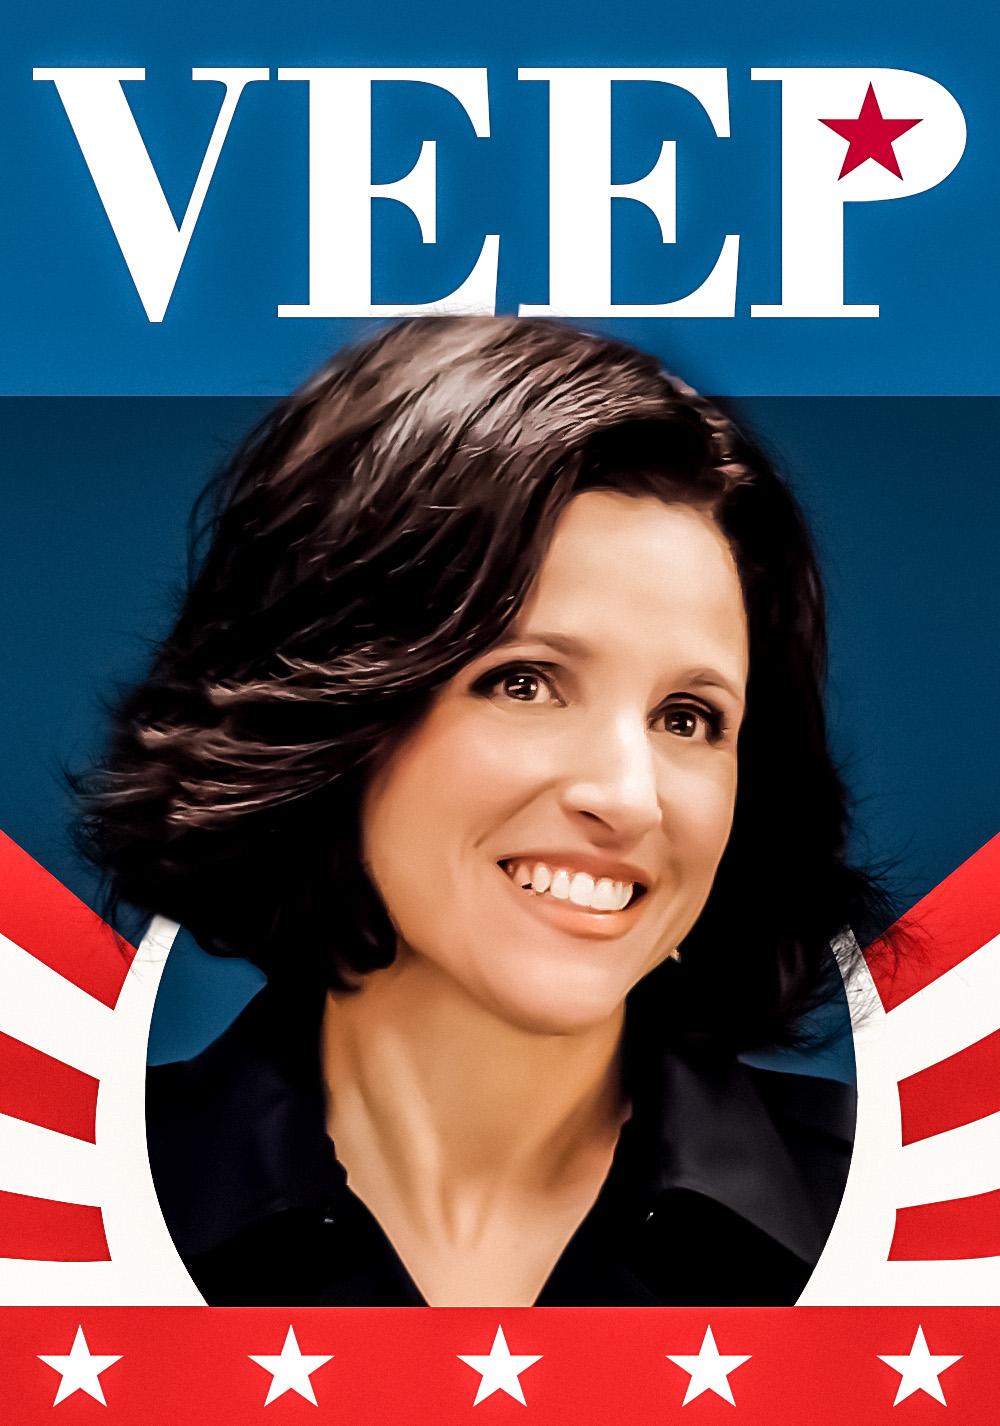 Veep (season 7)